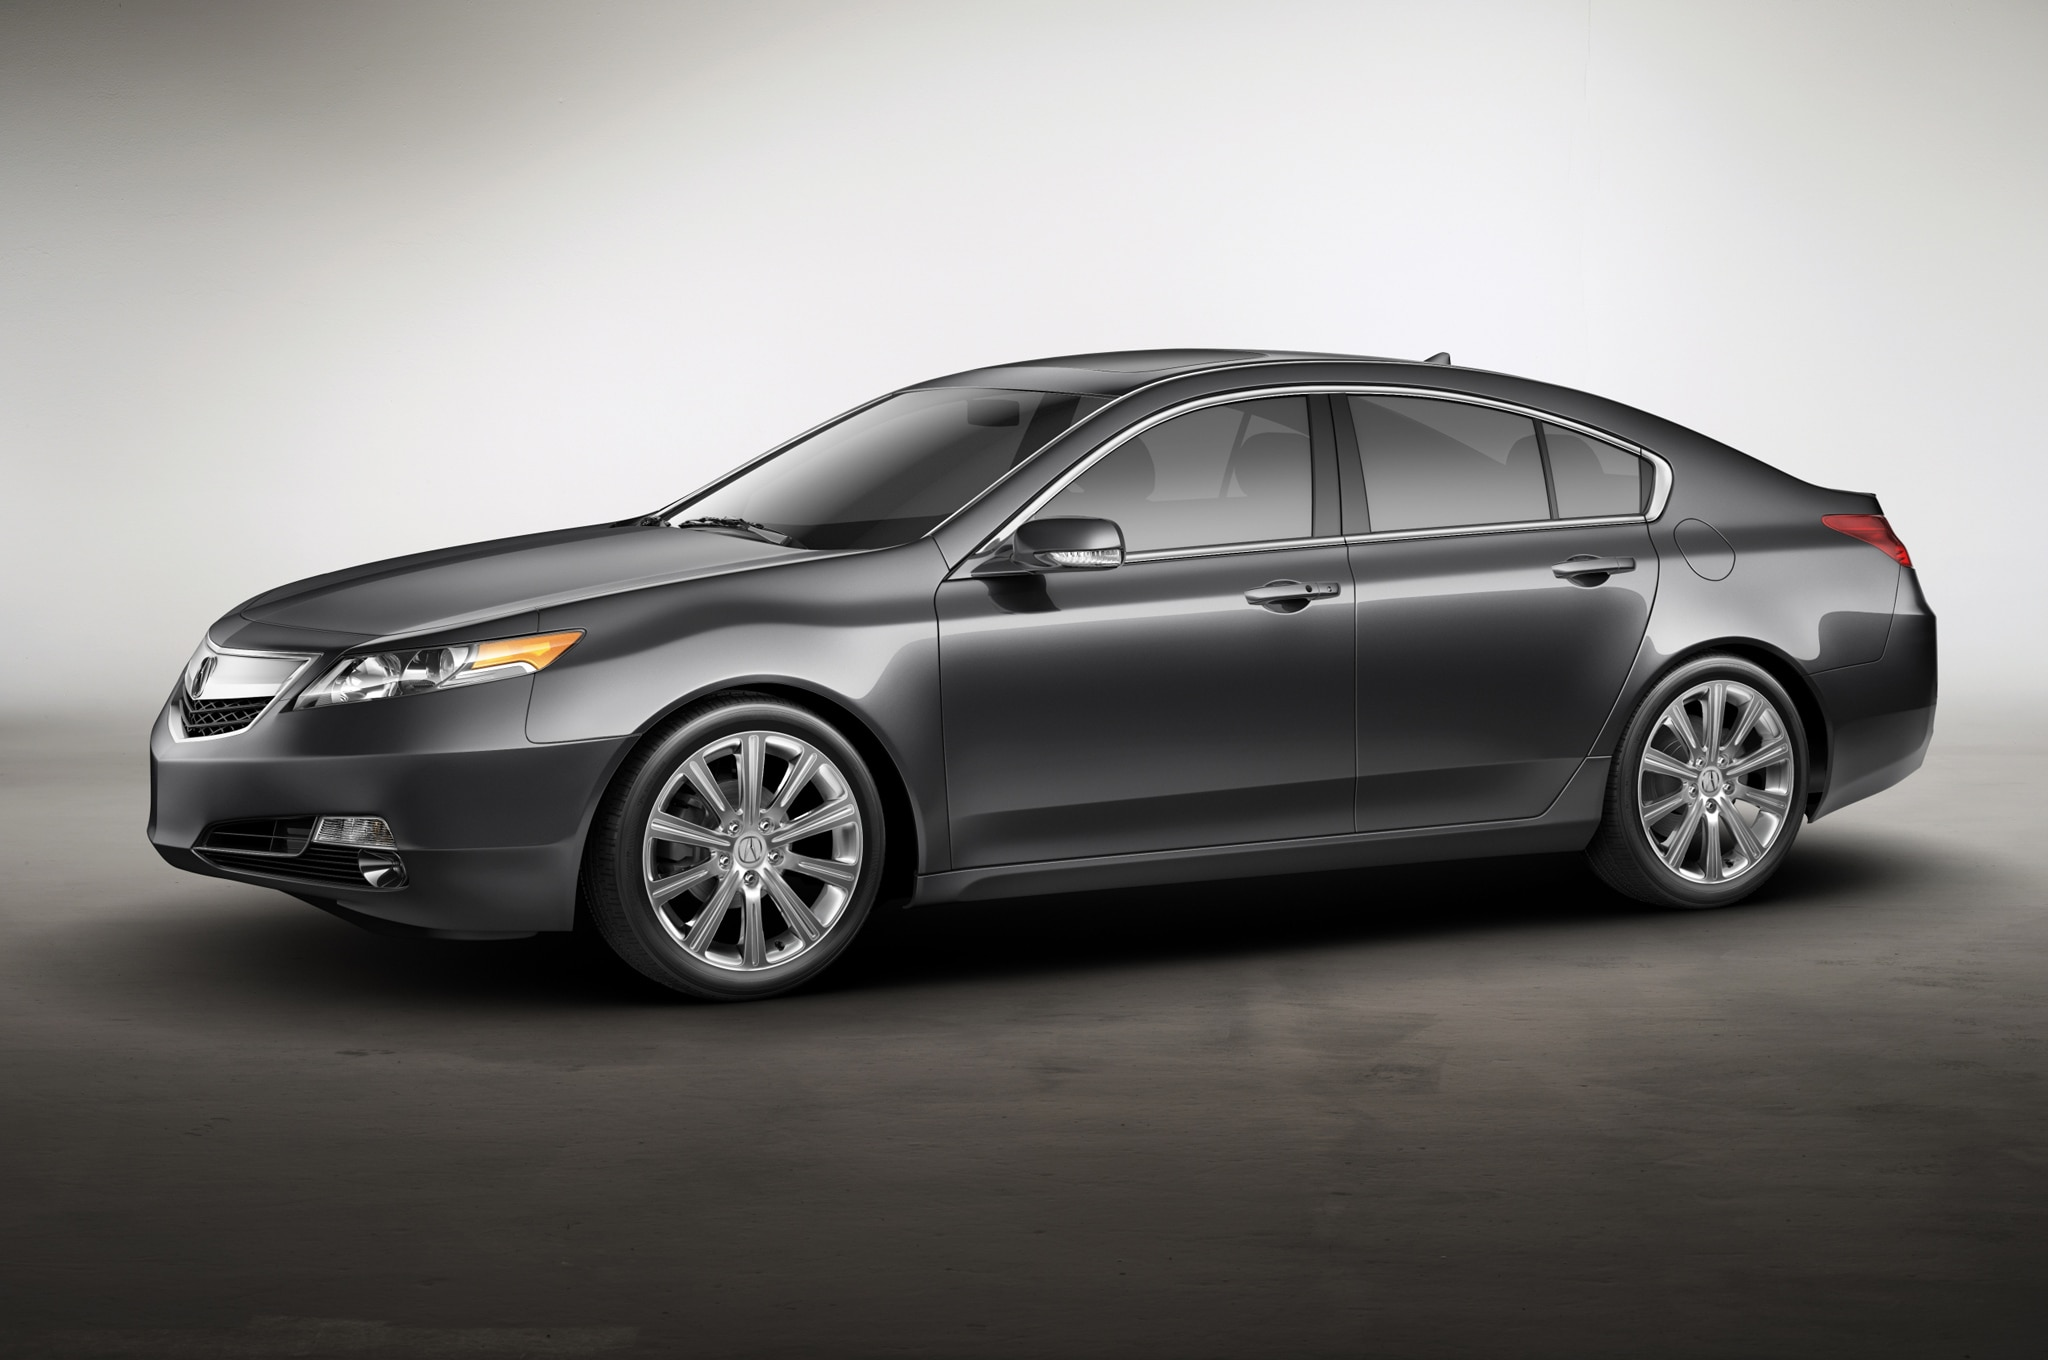 2014 Acura TL Special Edition Front Three Quarter1